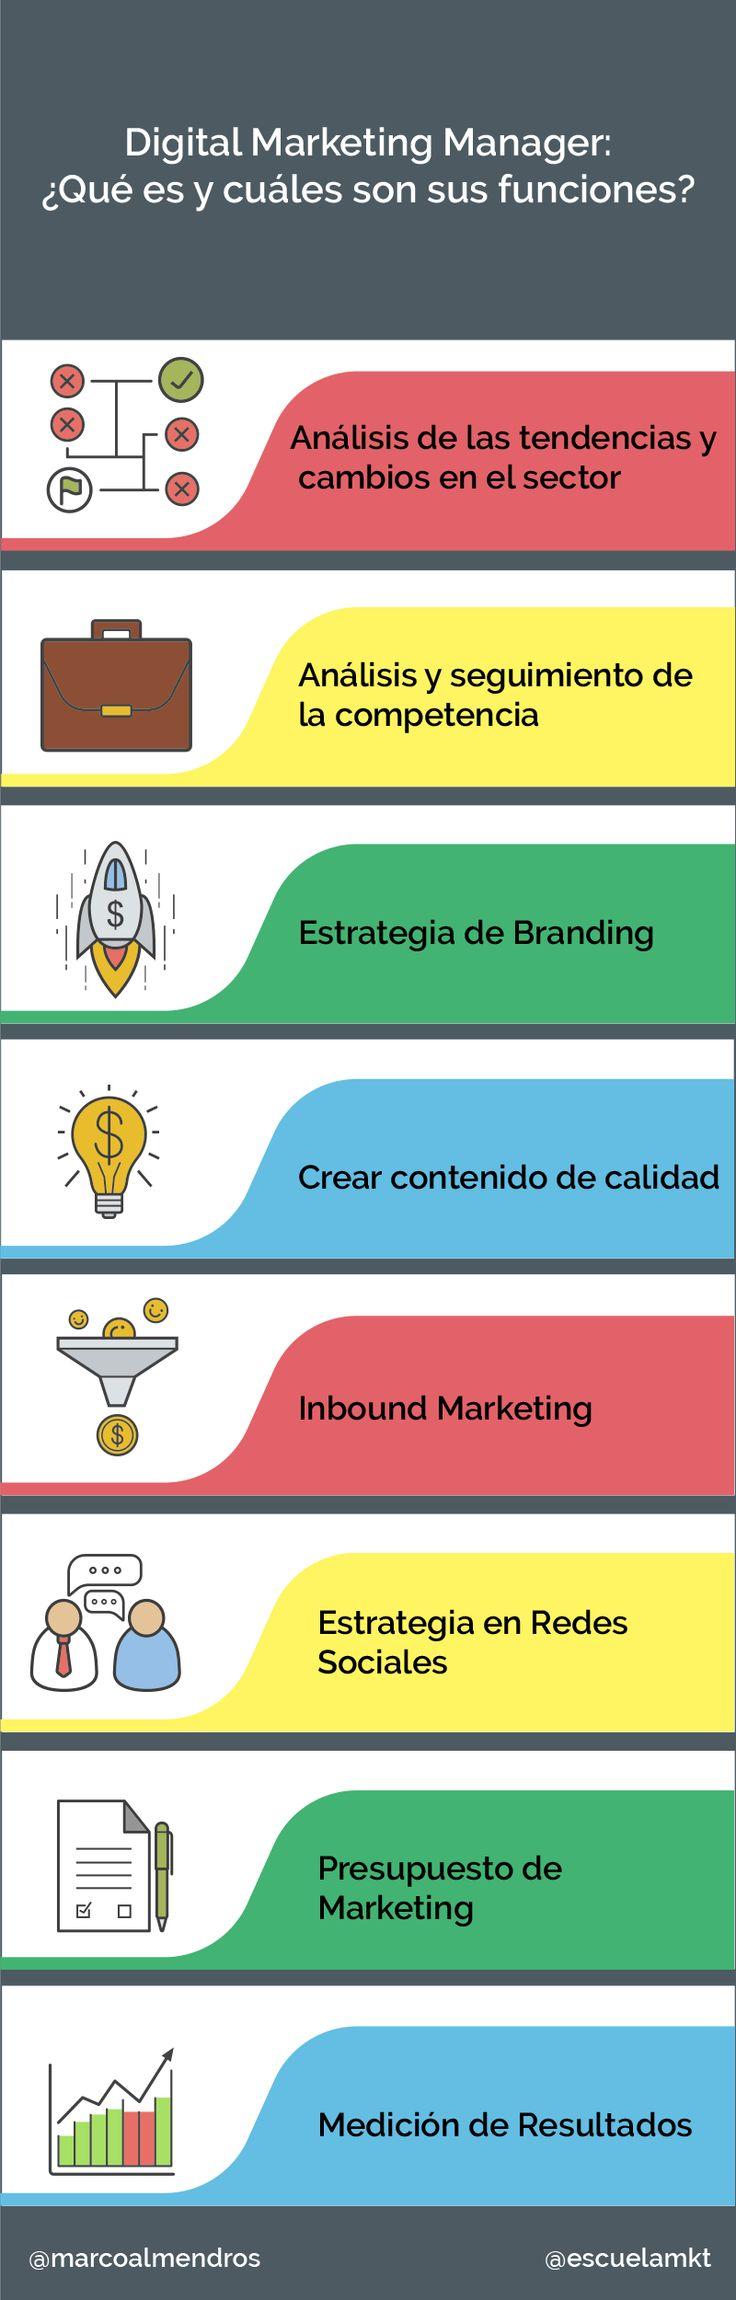 Funciones del Digital Marketing Manager #infografia #infographic #marketing